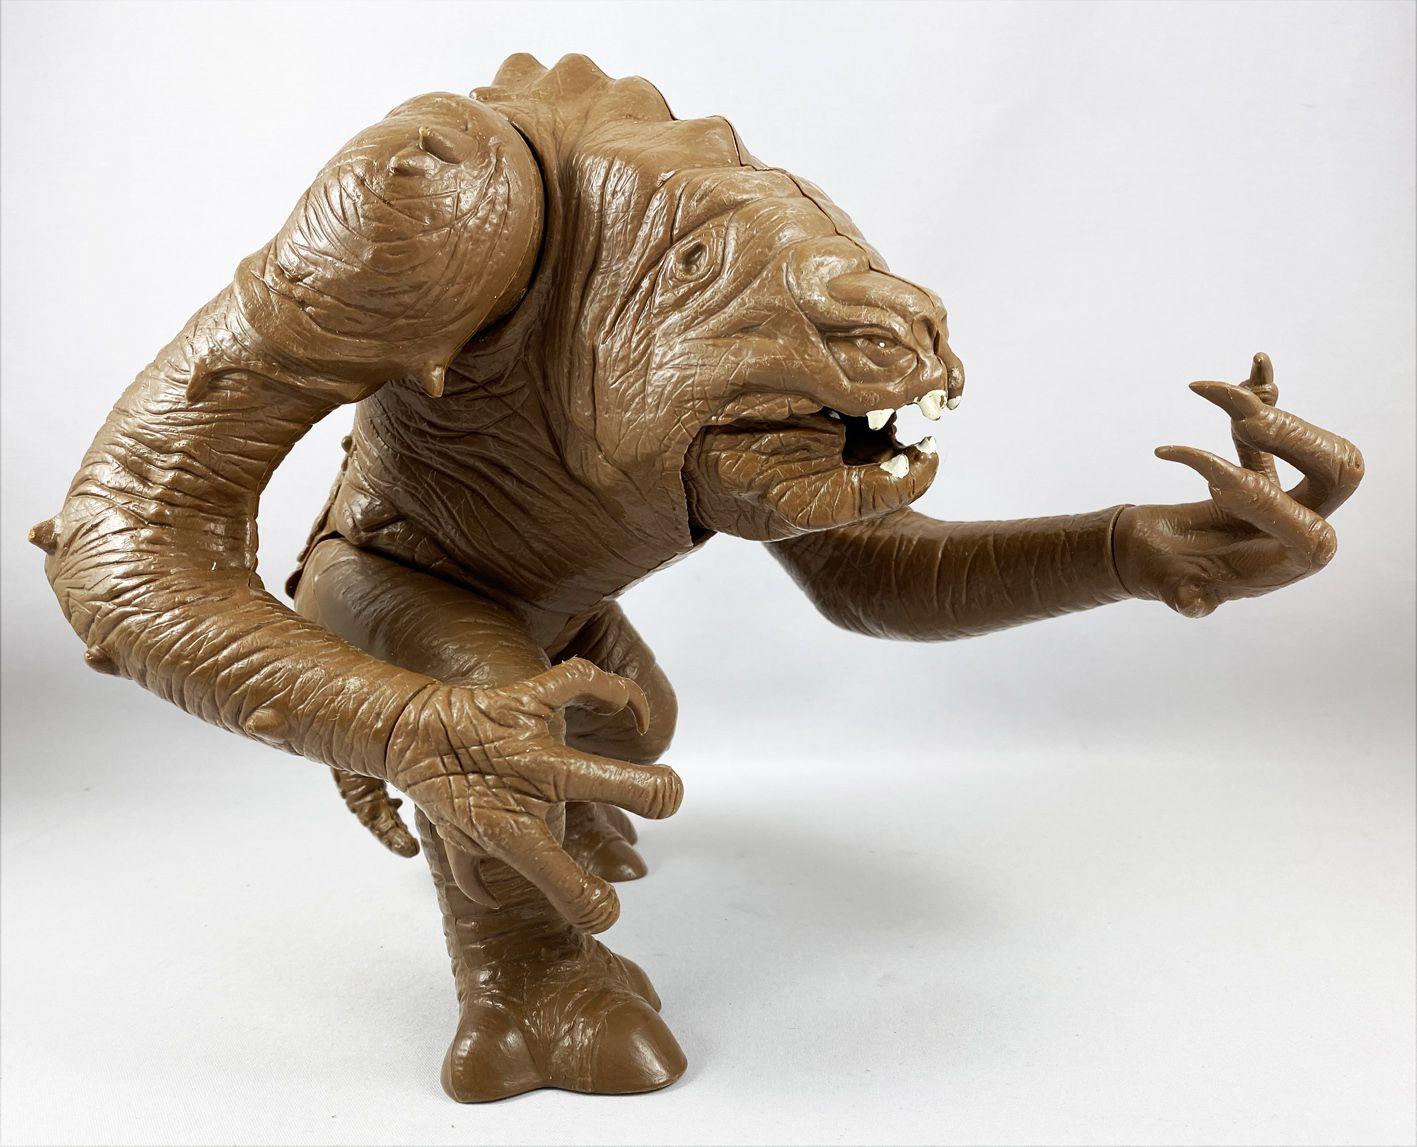 Star Wars (Return of the Jedi) 1983 - Kenner - Rancor Monster (loose)